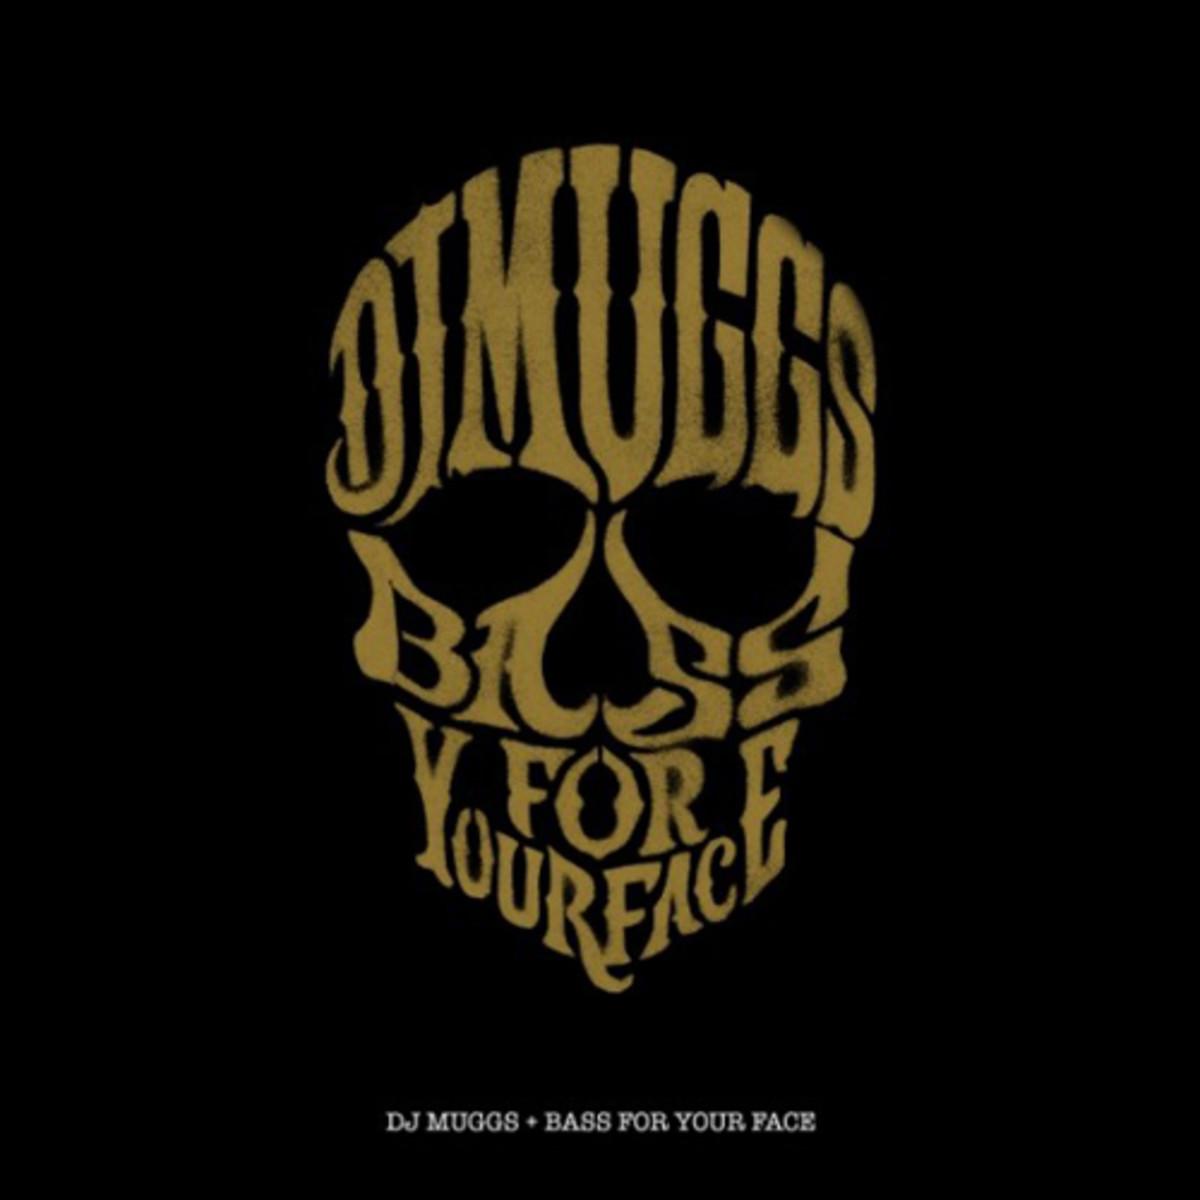 djmuggs-baseforyourface.jpg